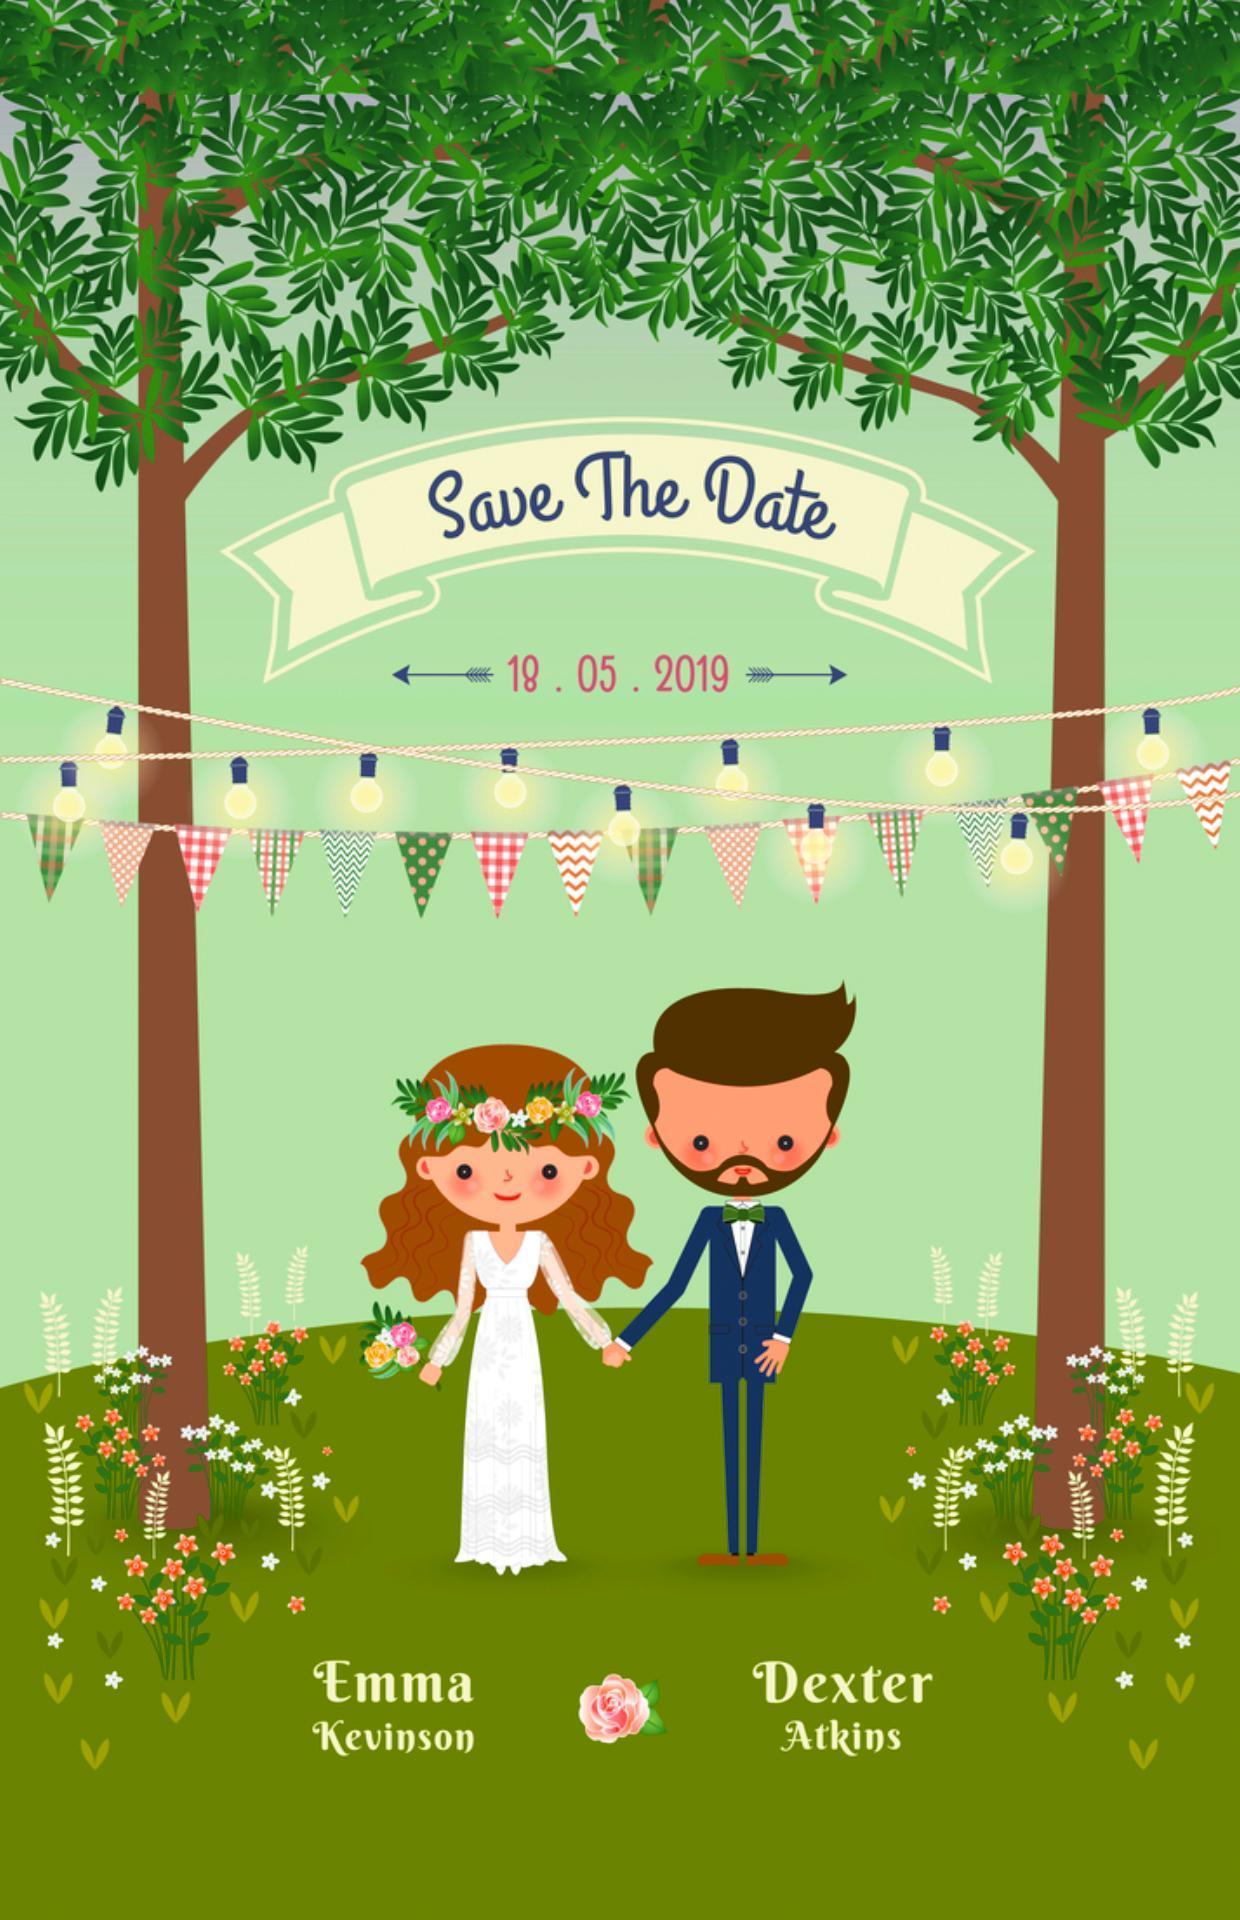 Wedding Invitation Card Maker - Card Maker for Android - APK Download